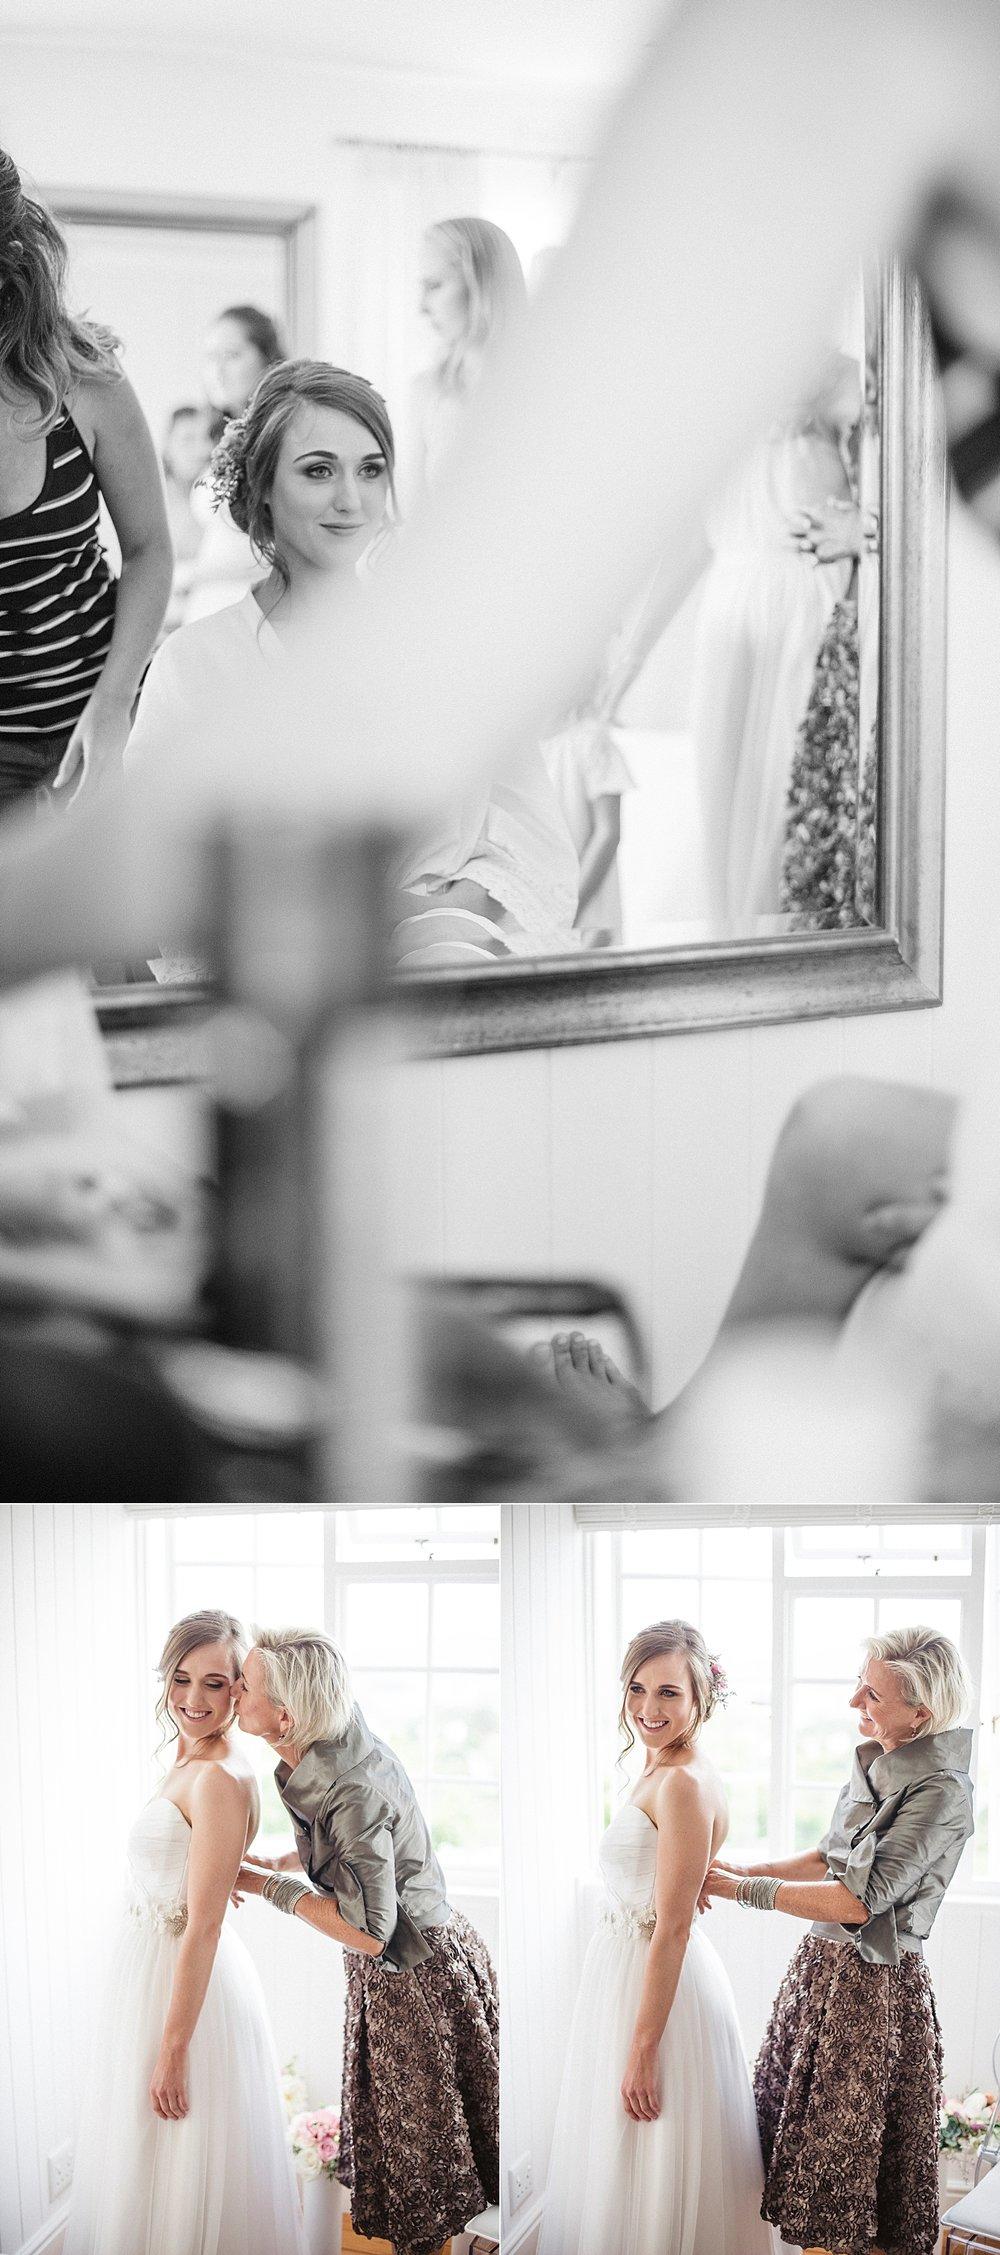 RyanParker_WeddingPhotographer_CapeTown_BonaDea_Hermanus_S&A_DSC_1384.jpg